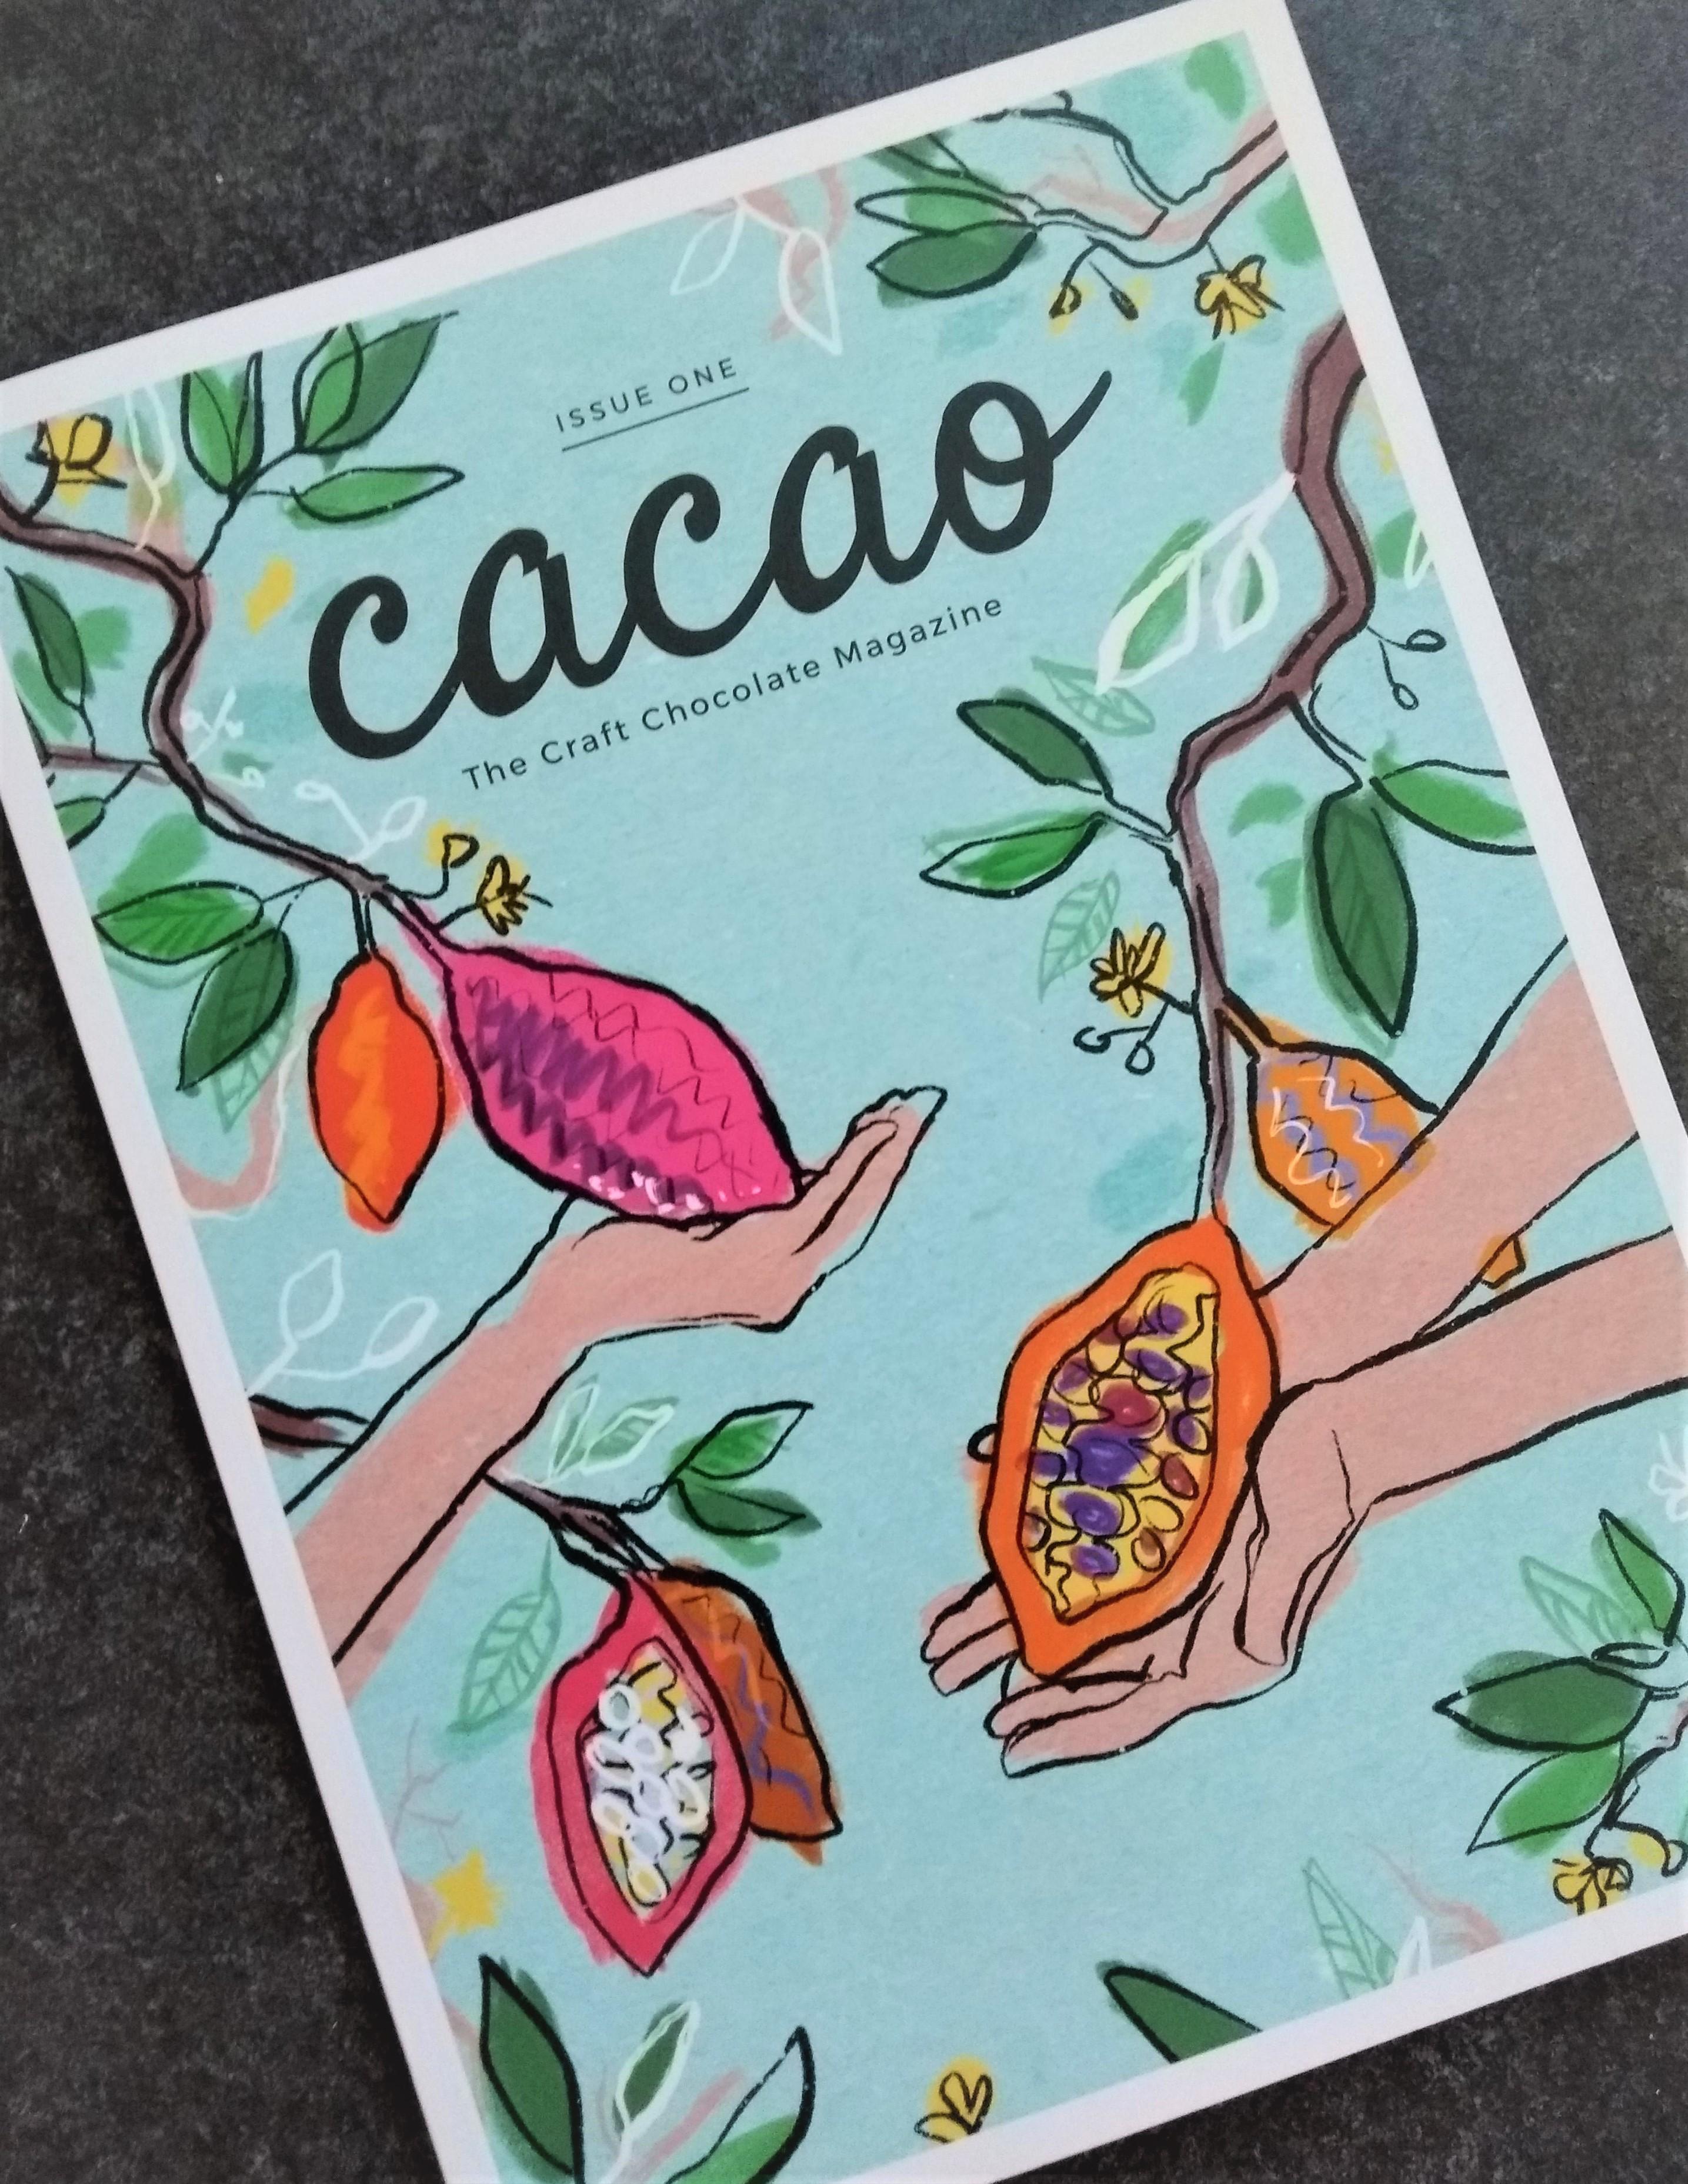 Cacao, the Craft Chocolate Magazine: lekker leesvoer!